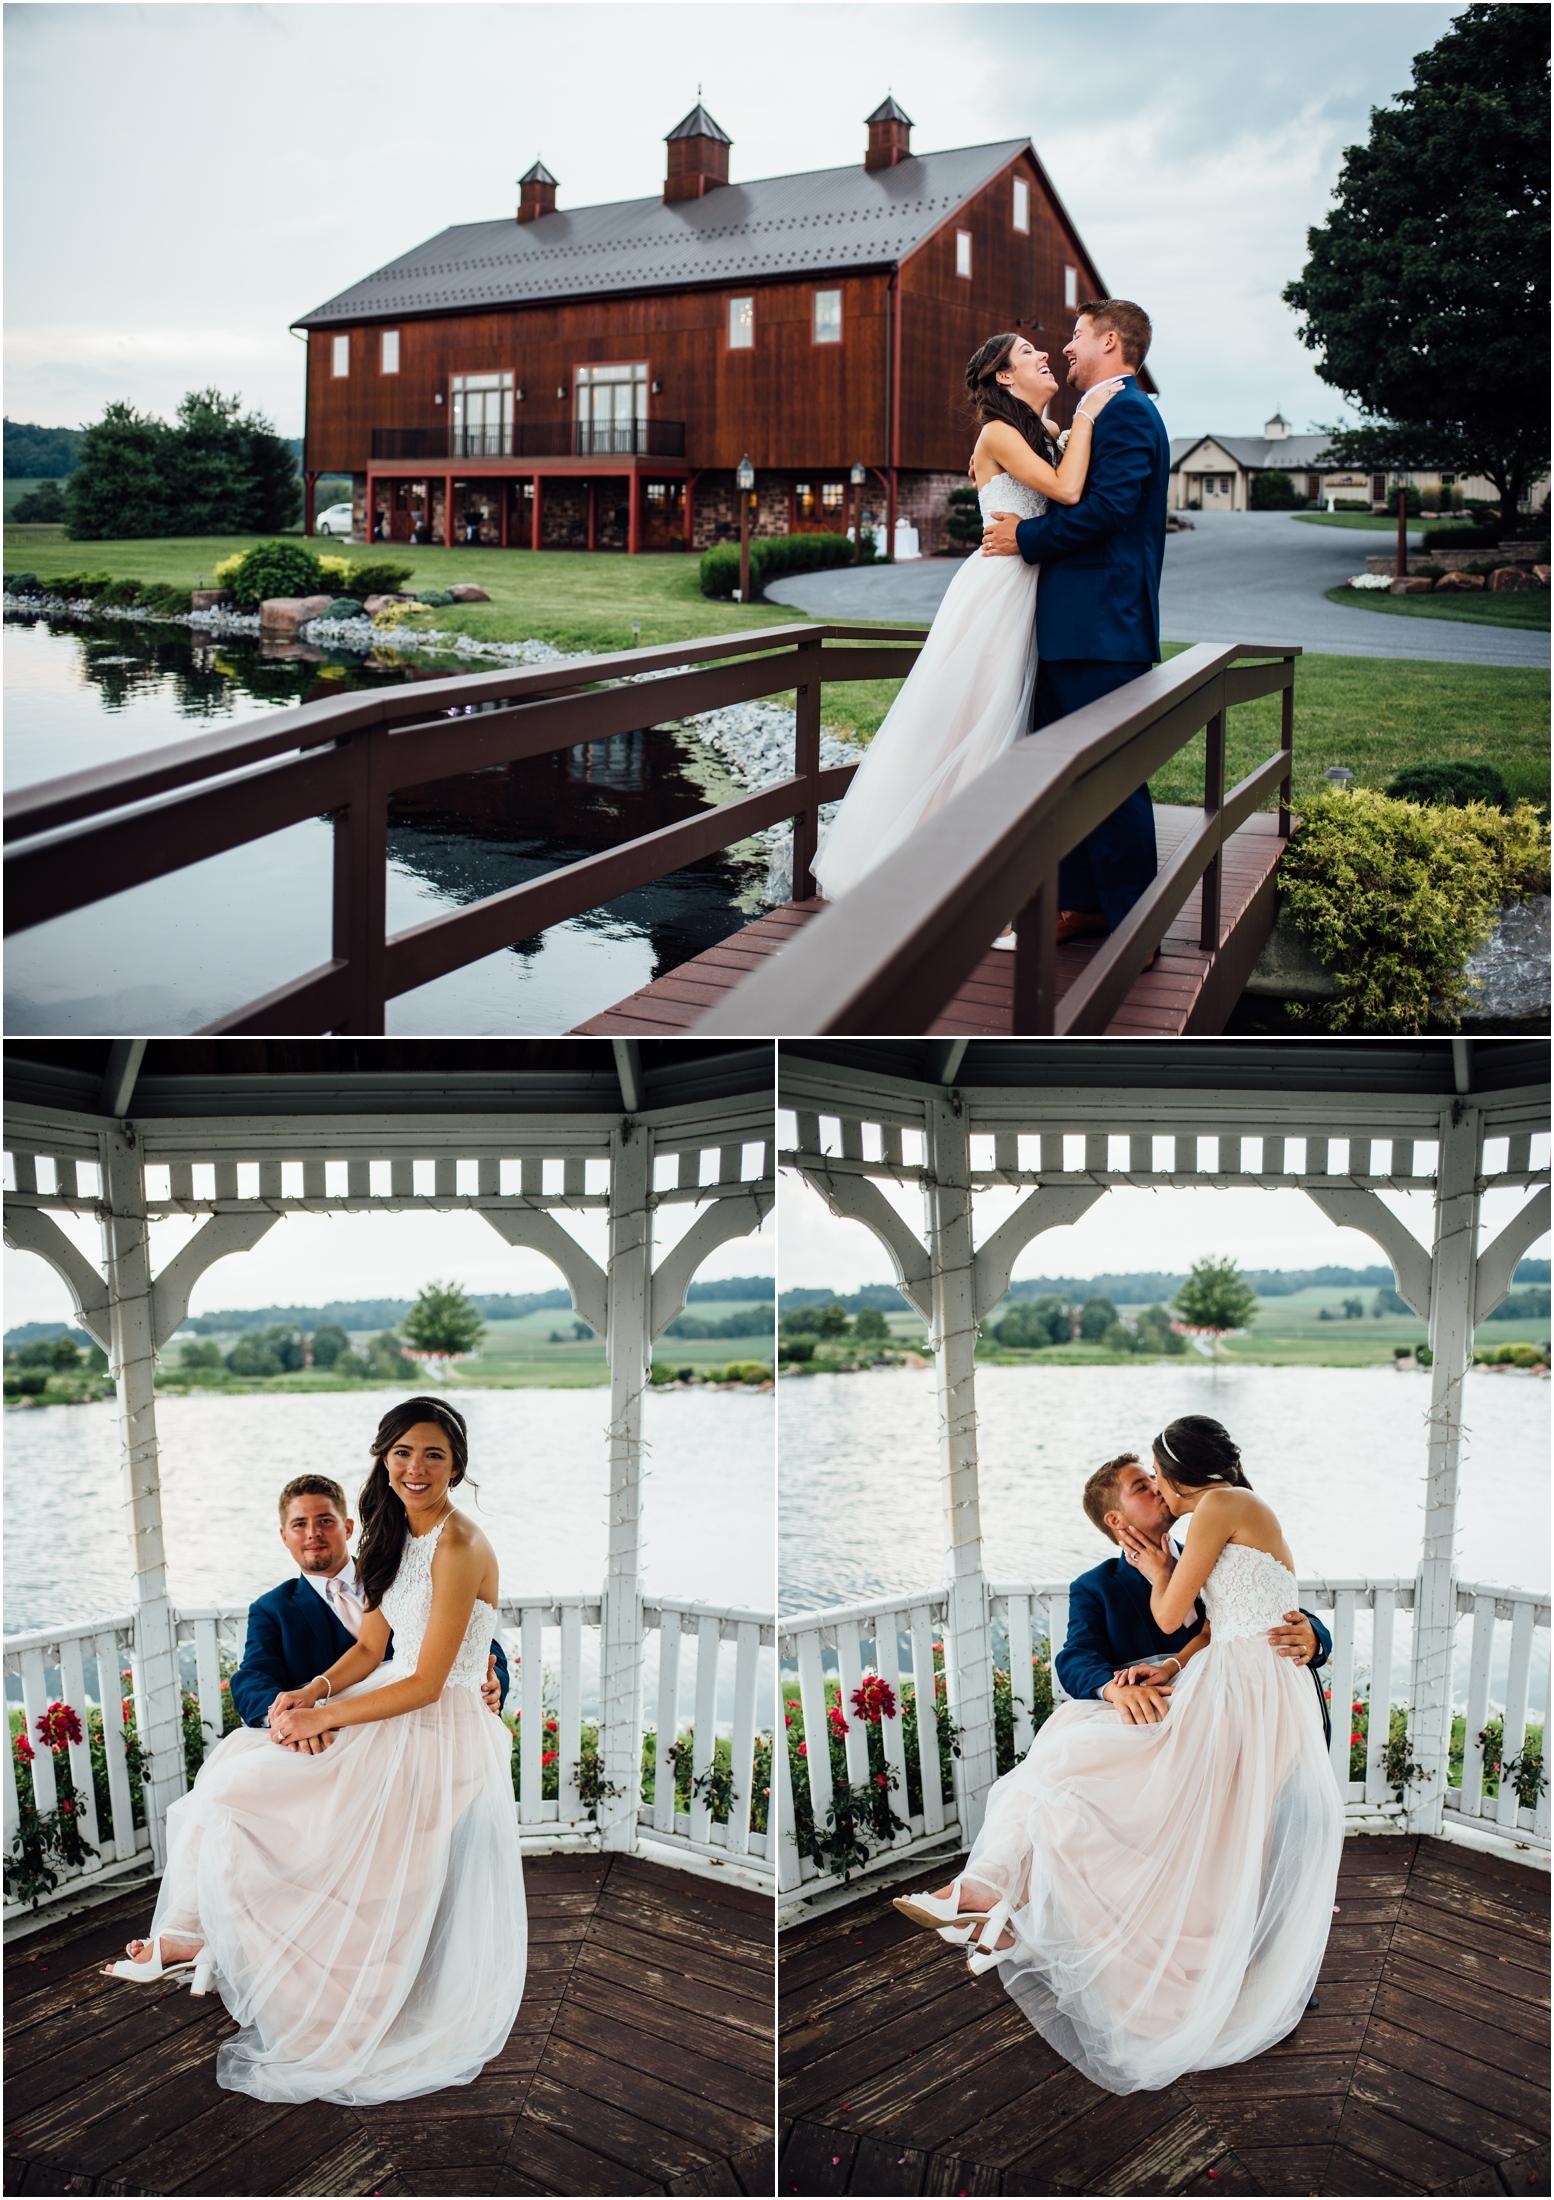 Steph&Bryan_Lancaster_wedding_farm_0547.jpg